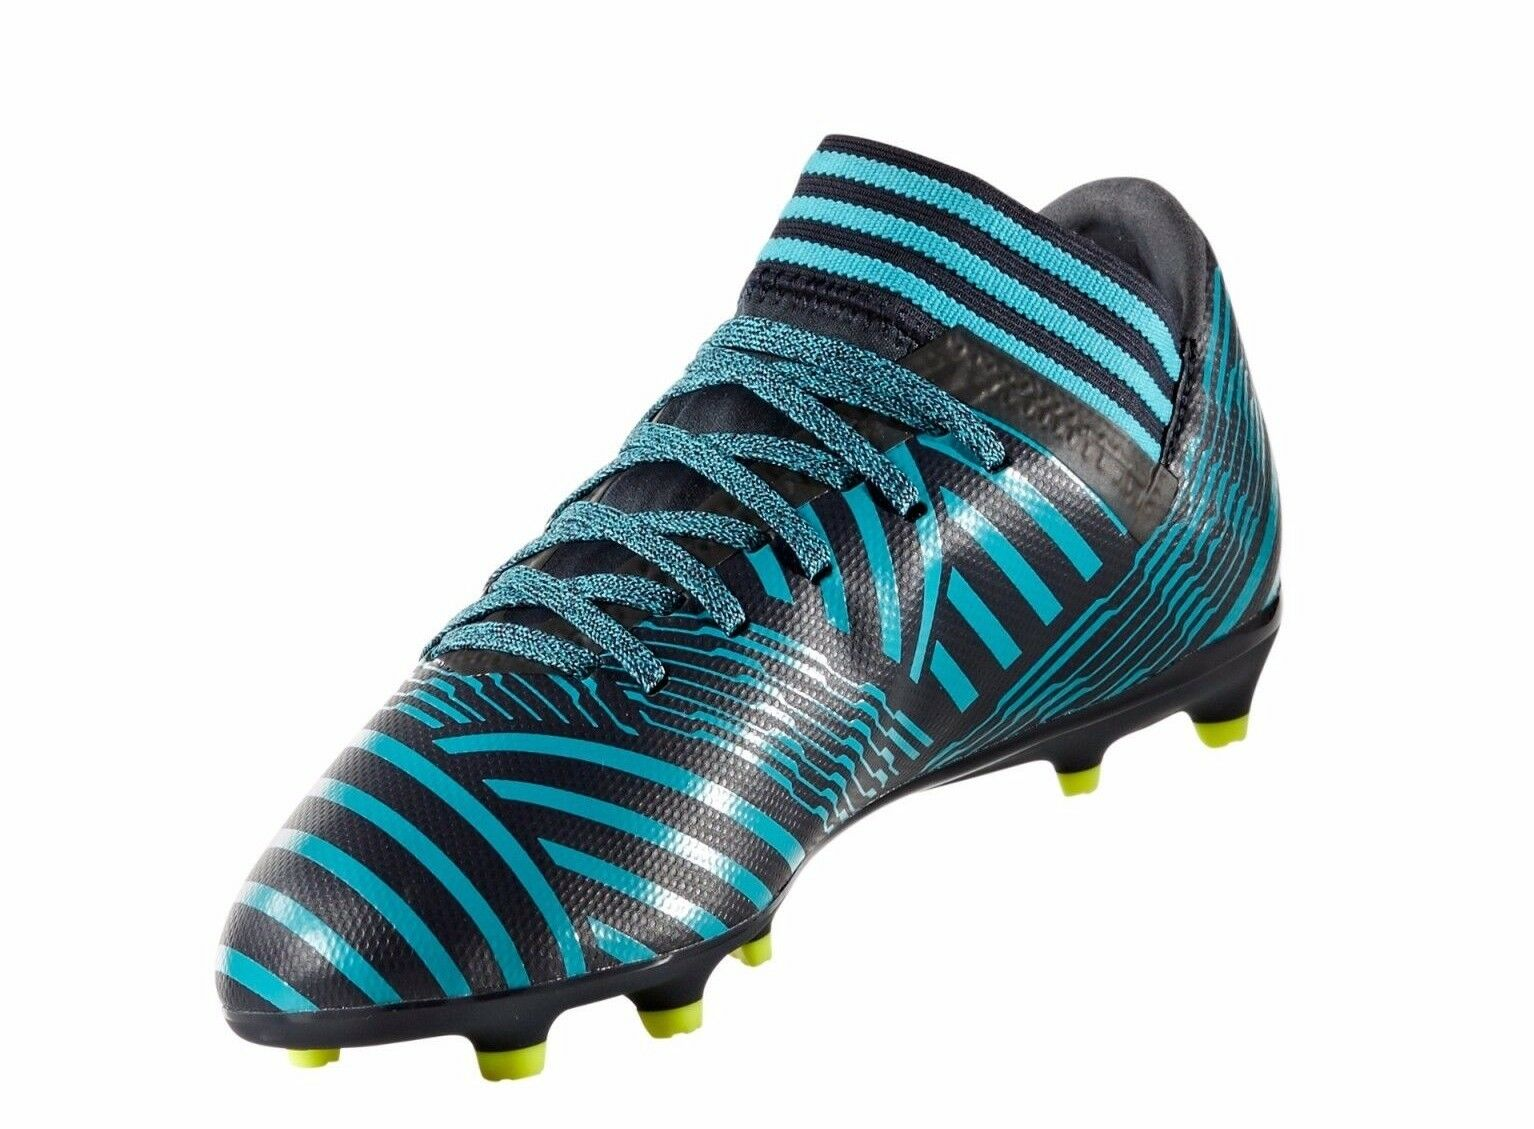 08fd4d6c7 Adidas Soccer shoes Kids Nemeziz 17.3 FG Junior Boys Football Boots S82427  New